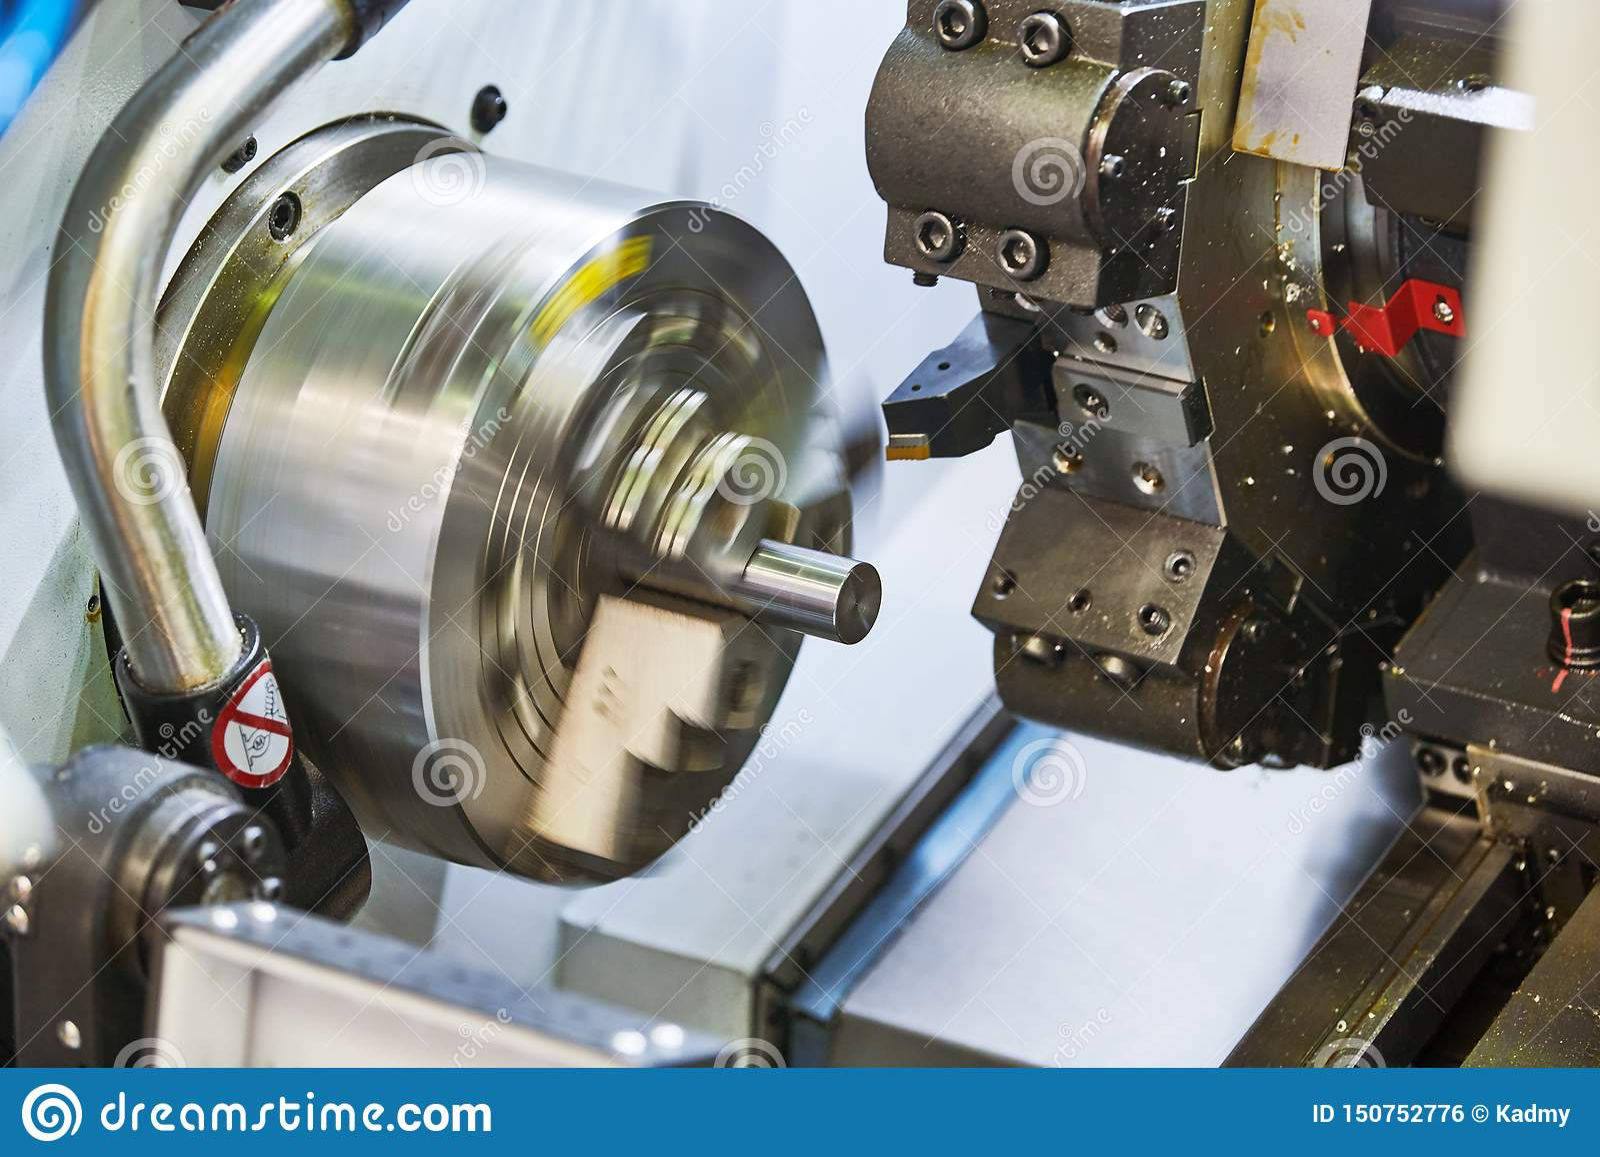 Turning Cnc Machine At Metal Work Industry  Precision